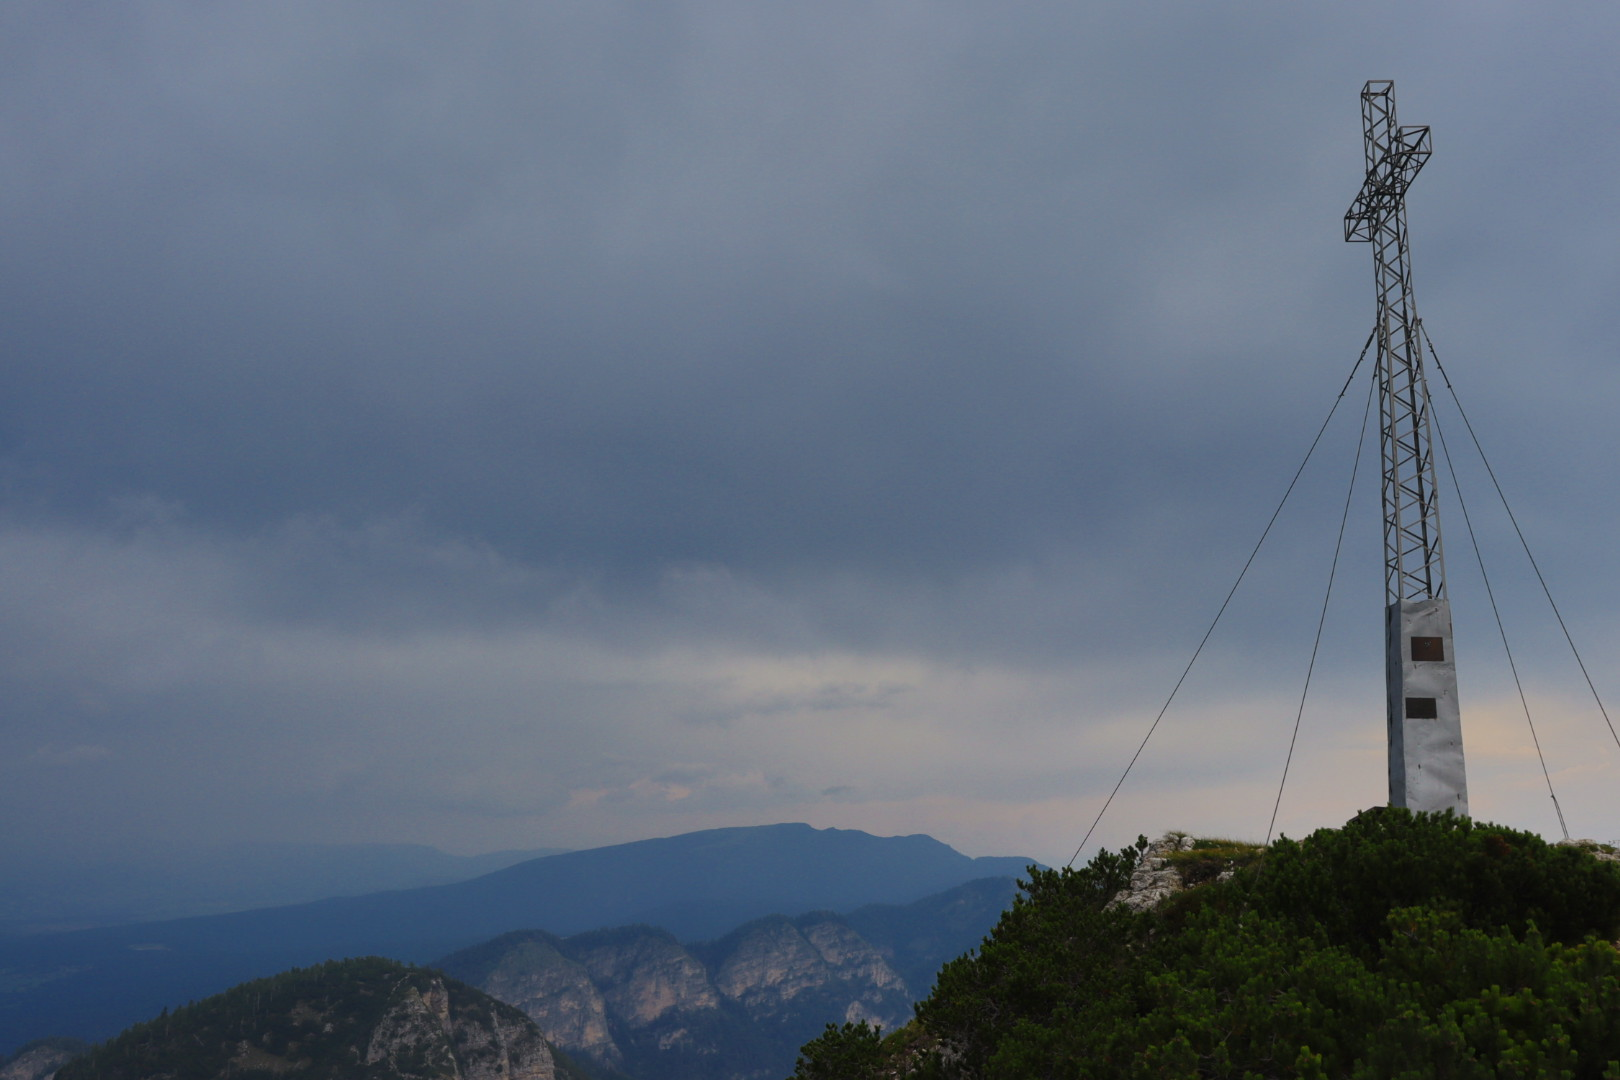 Cima Roccapiana (1874 meters)